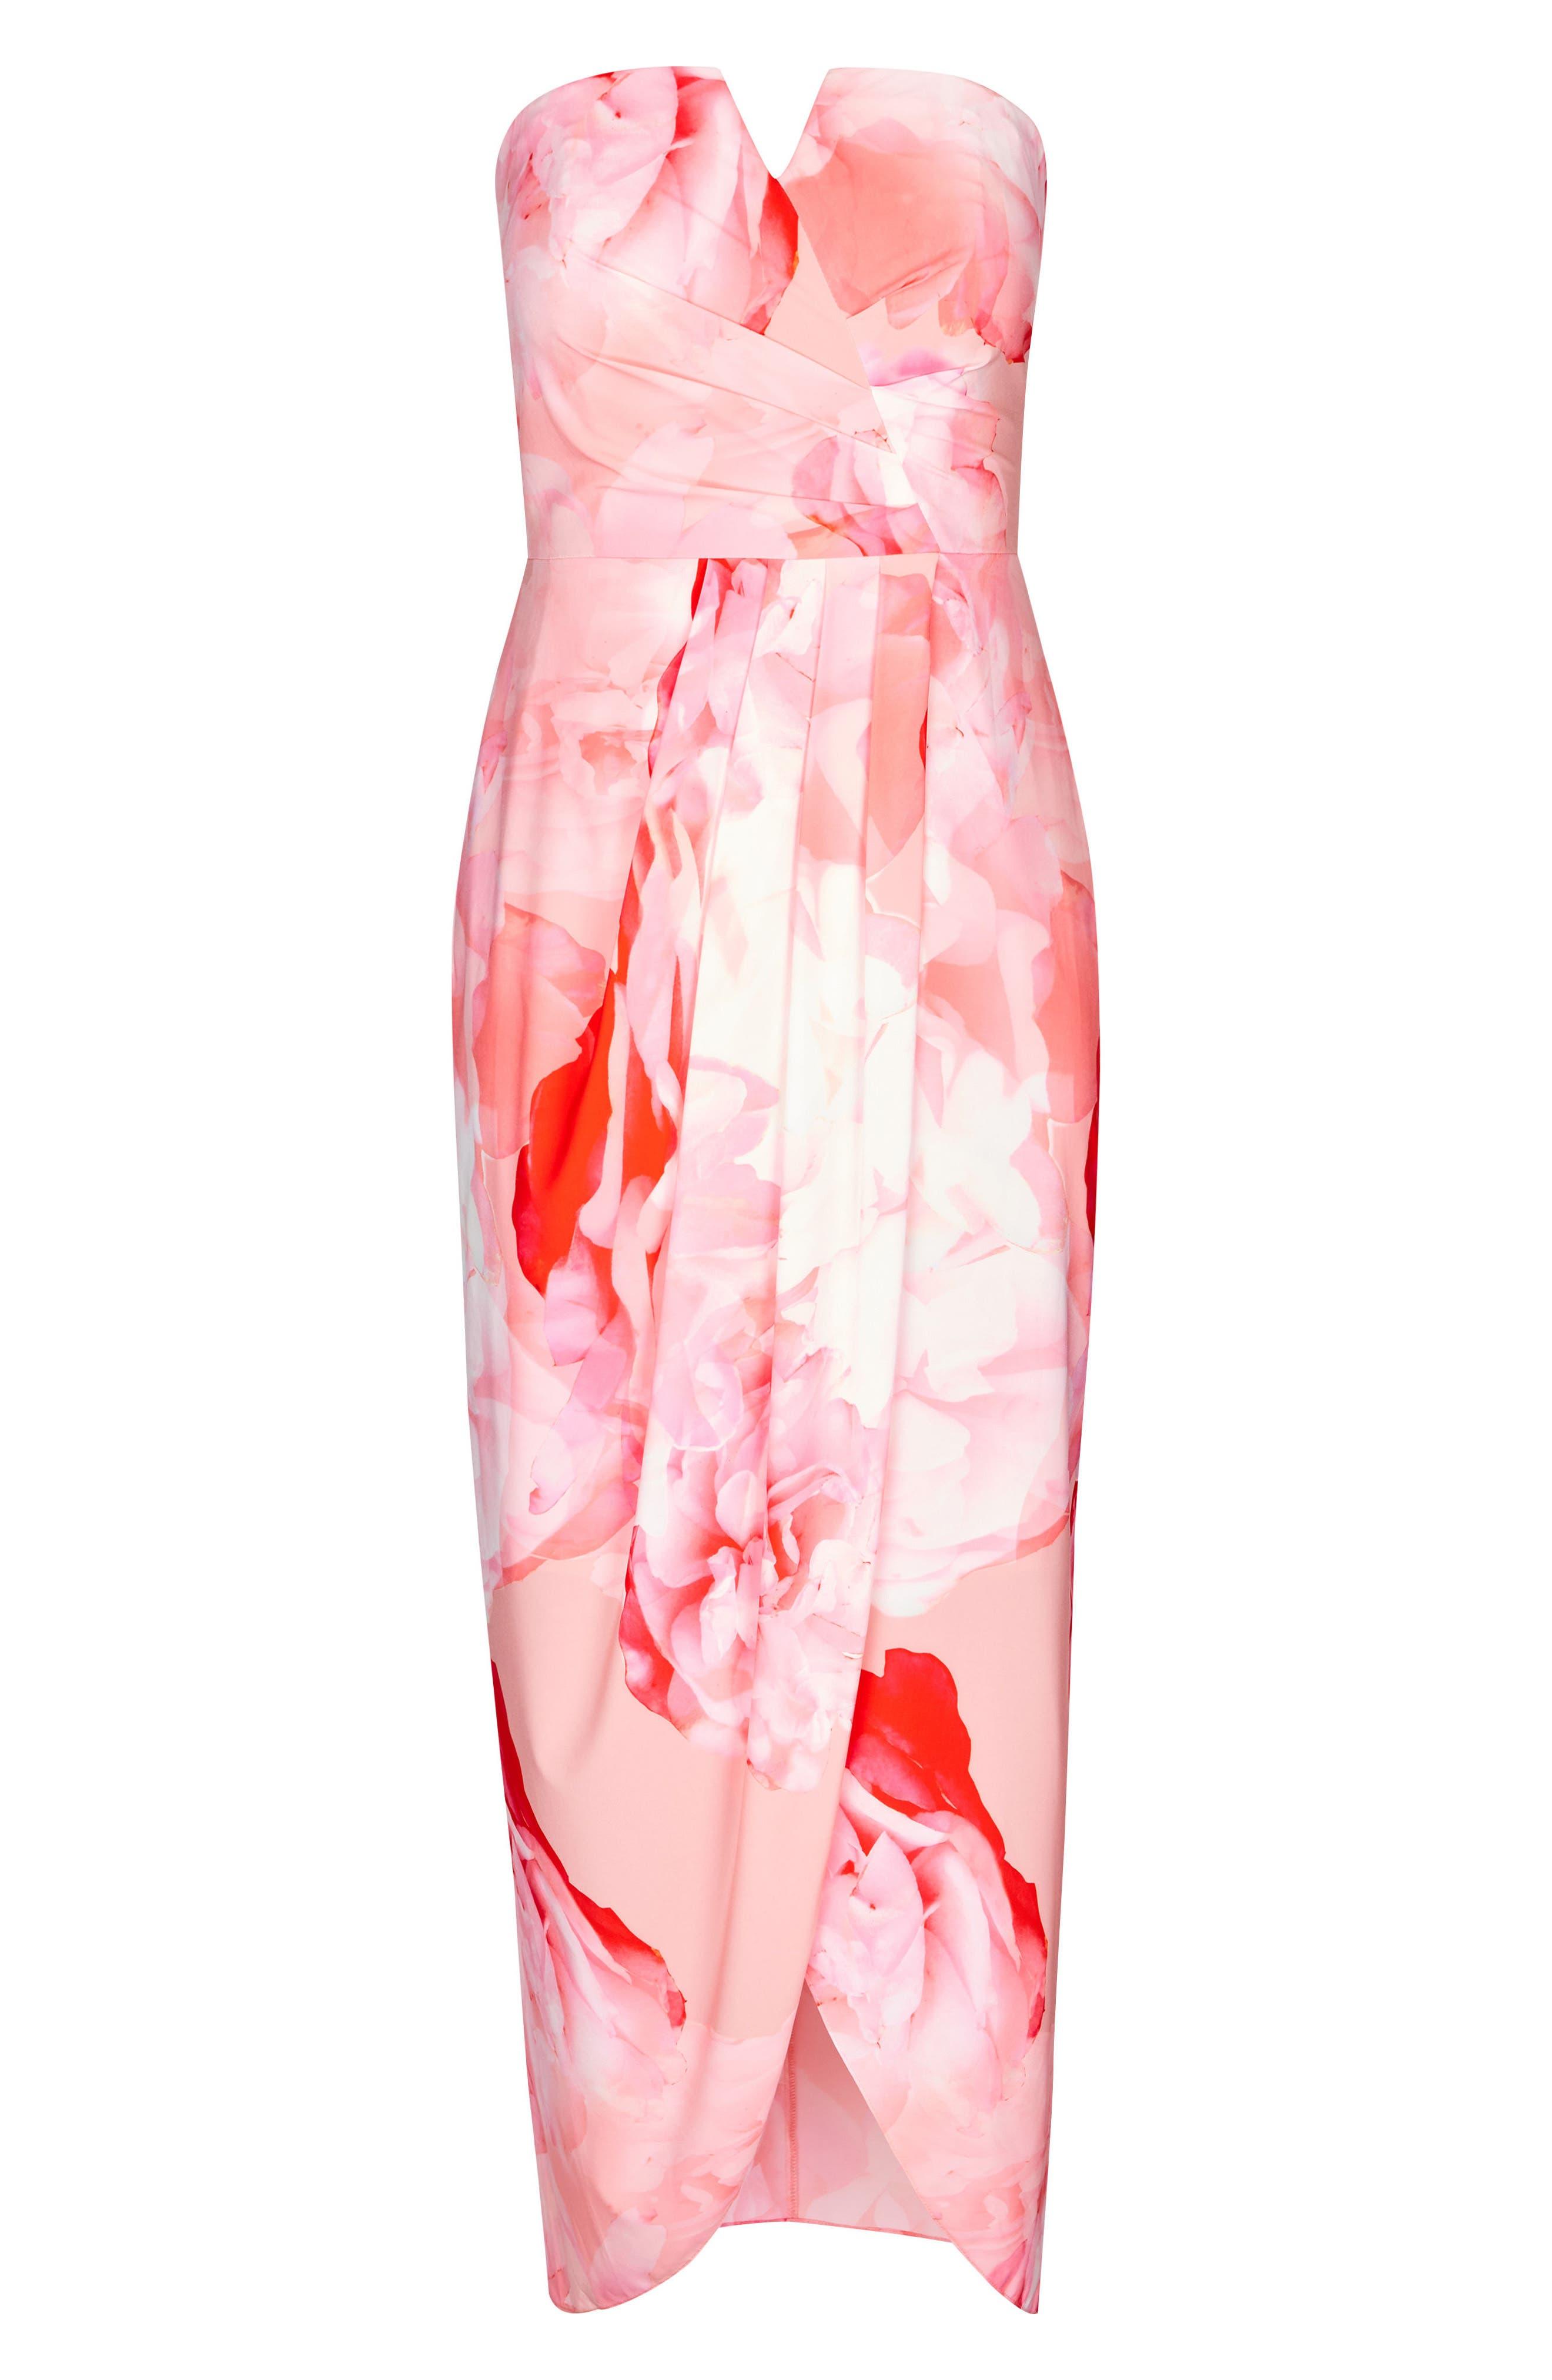 Girly Rose Strapless Maxi Dress,                             Alternate thumbnail 3, color,                             Girly Rose